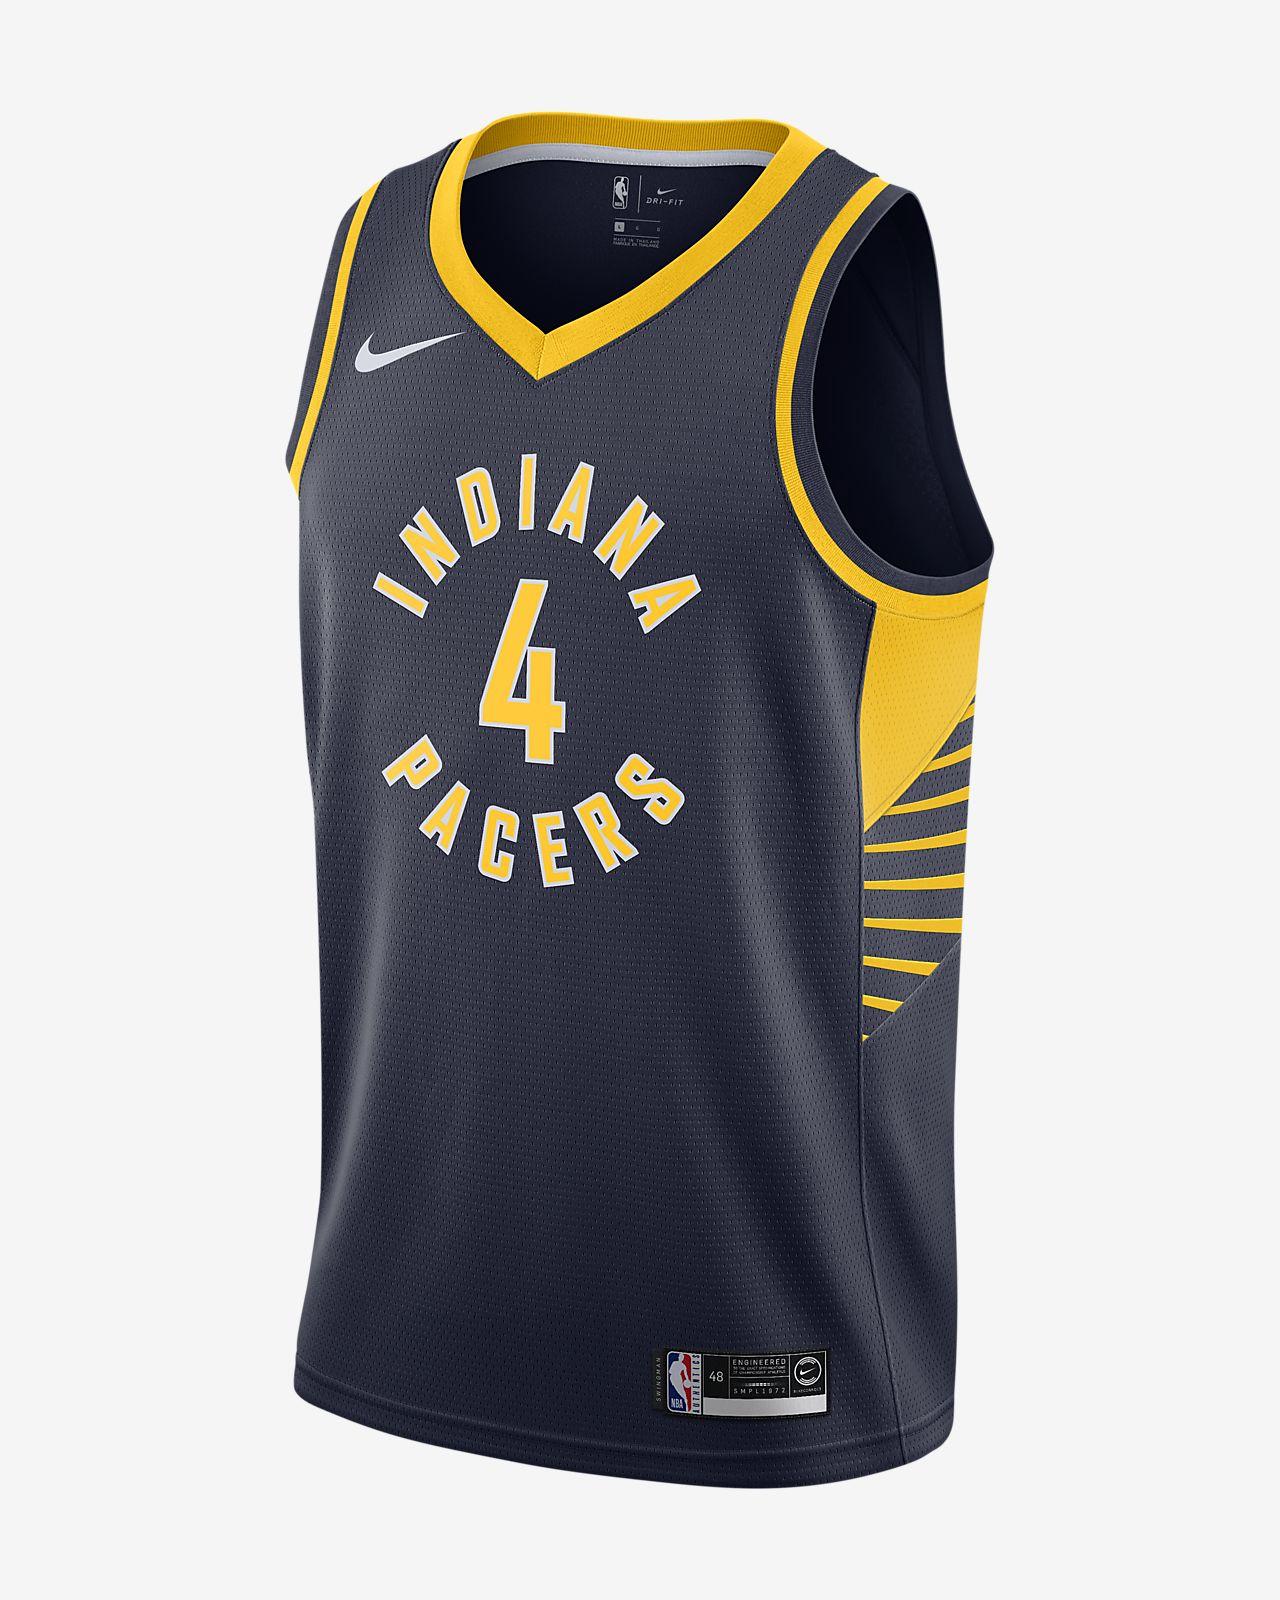 Camiseta conectada Nike NBA para hombre Victor Oladipo Icon Edition Swingman (Indiana Pacers)